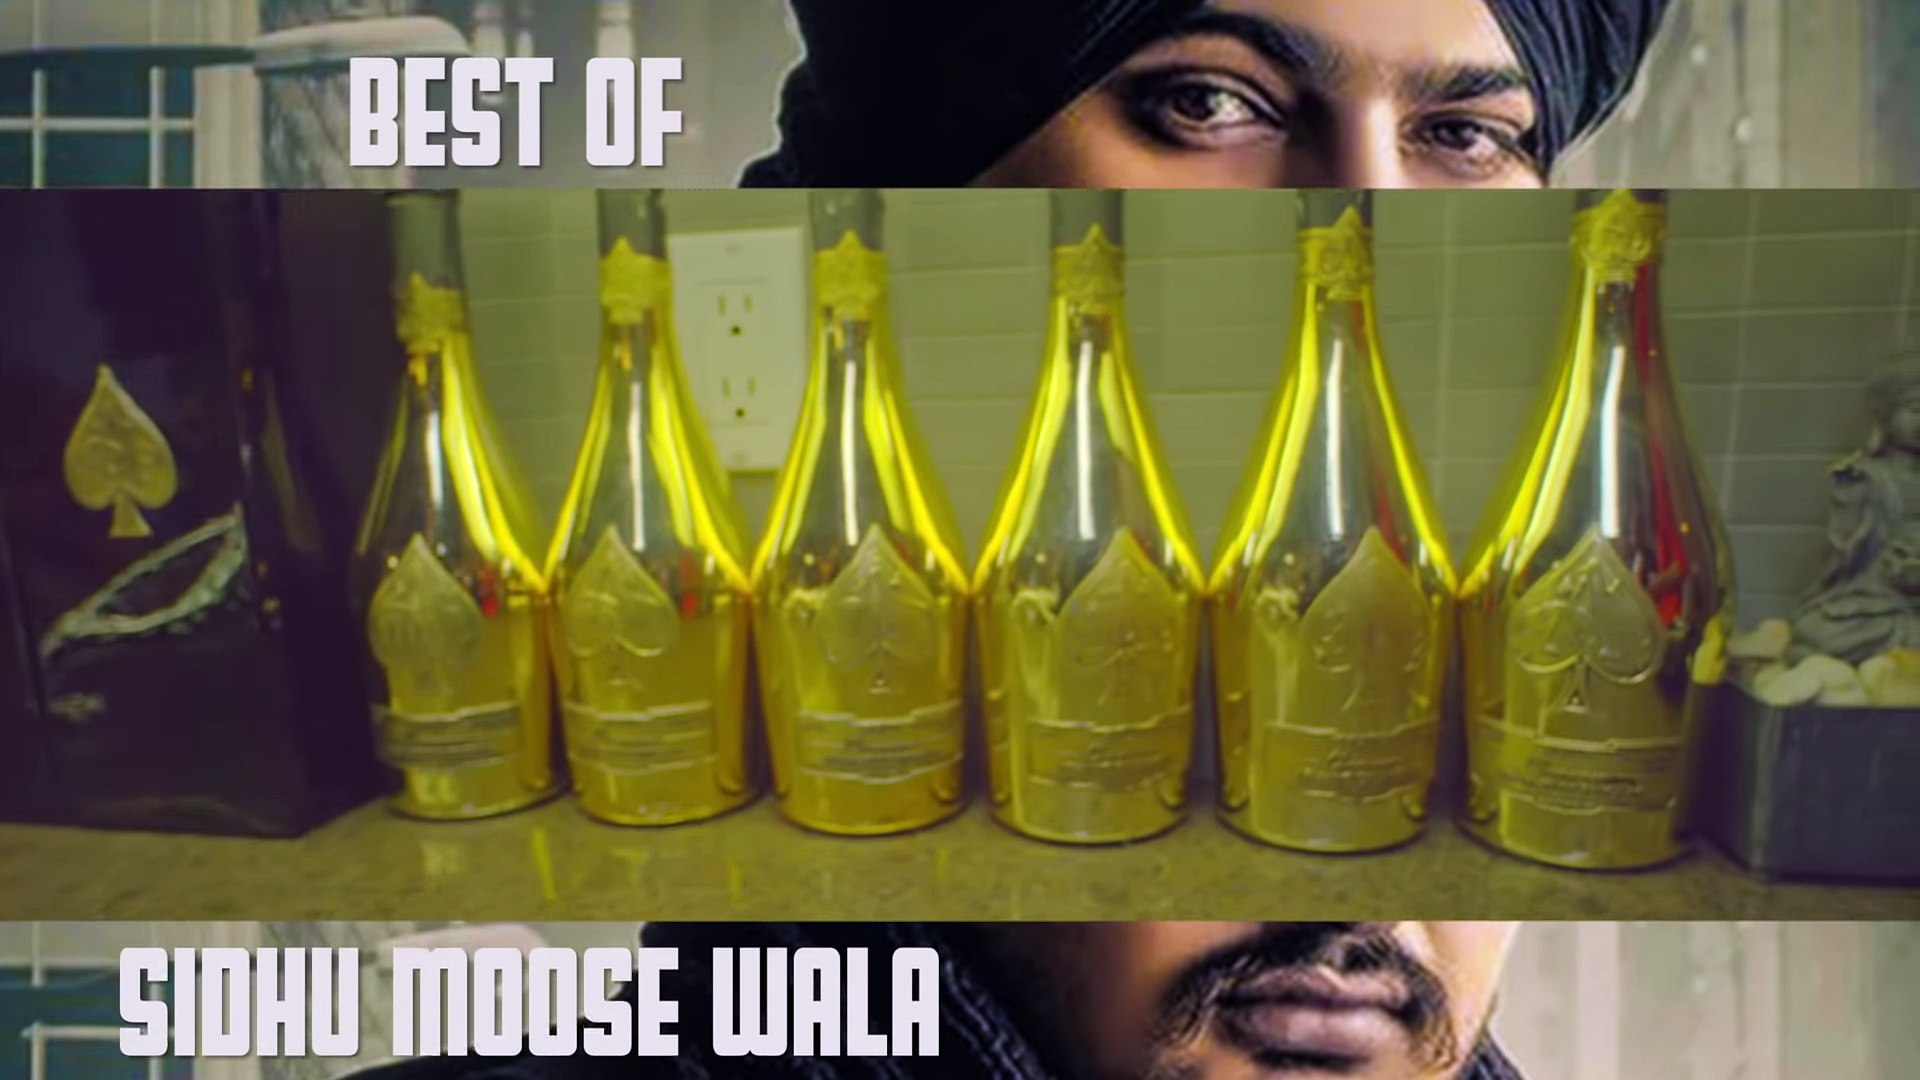 New Punjabi Songs - Best Of Sidhu Moose Wala - HD(Full Songs) - Deep Jandu  - Ninja - Video JukeBox - Latest Punjabi Songs - PK hungama mASTI Official  Channel